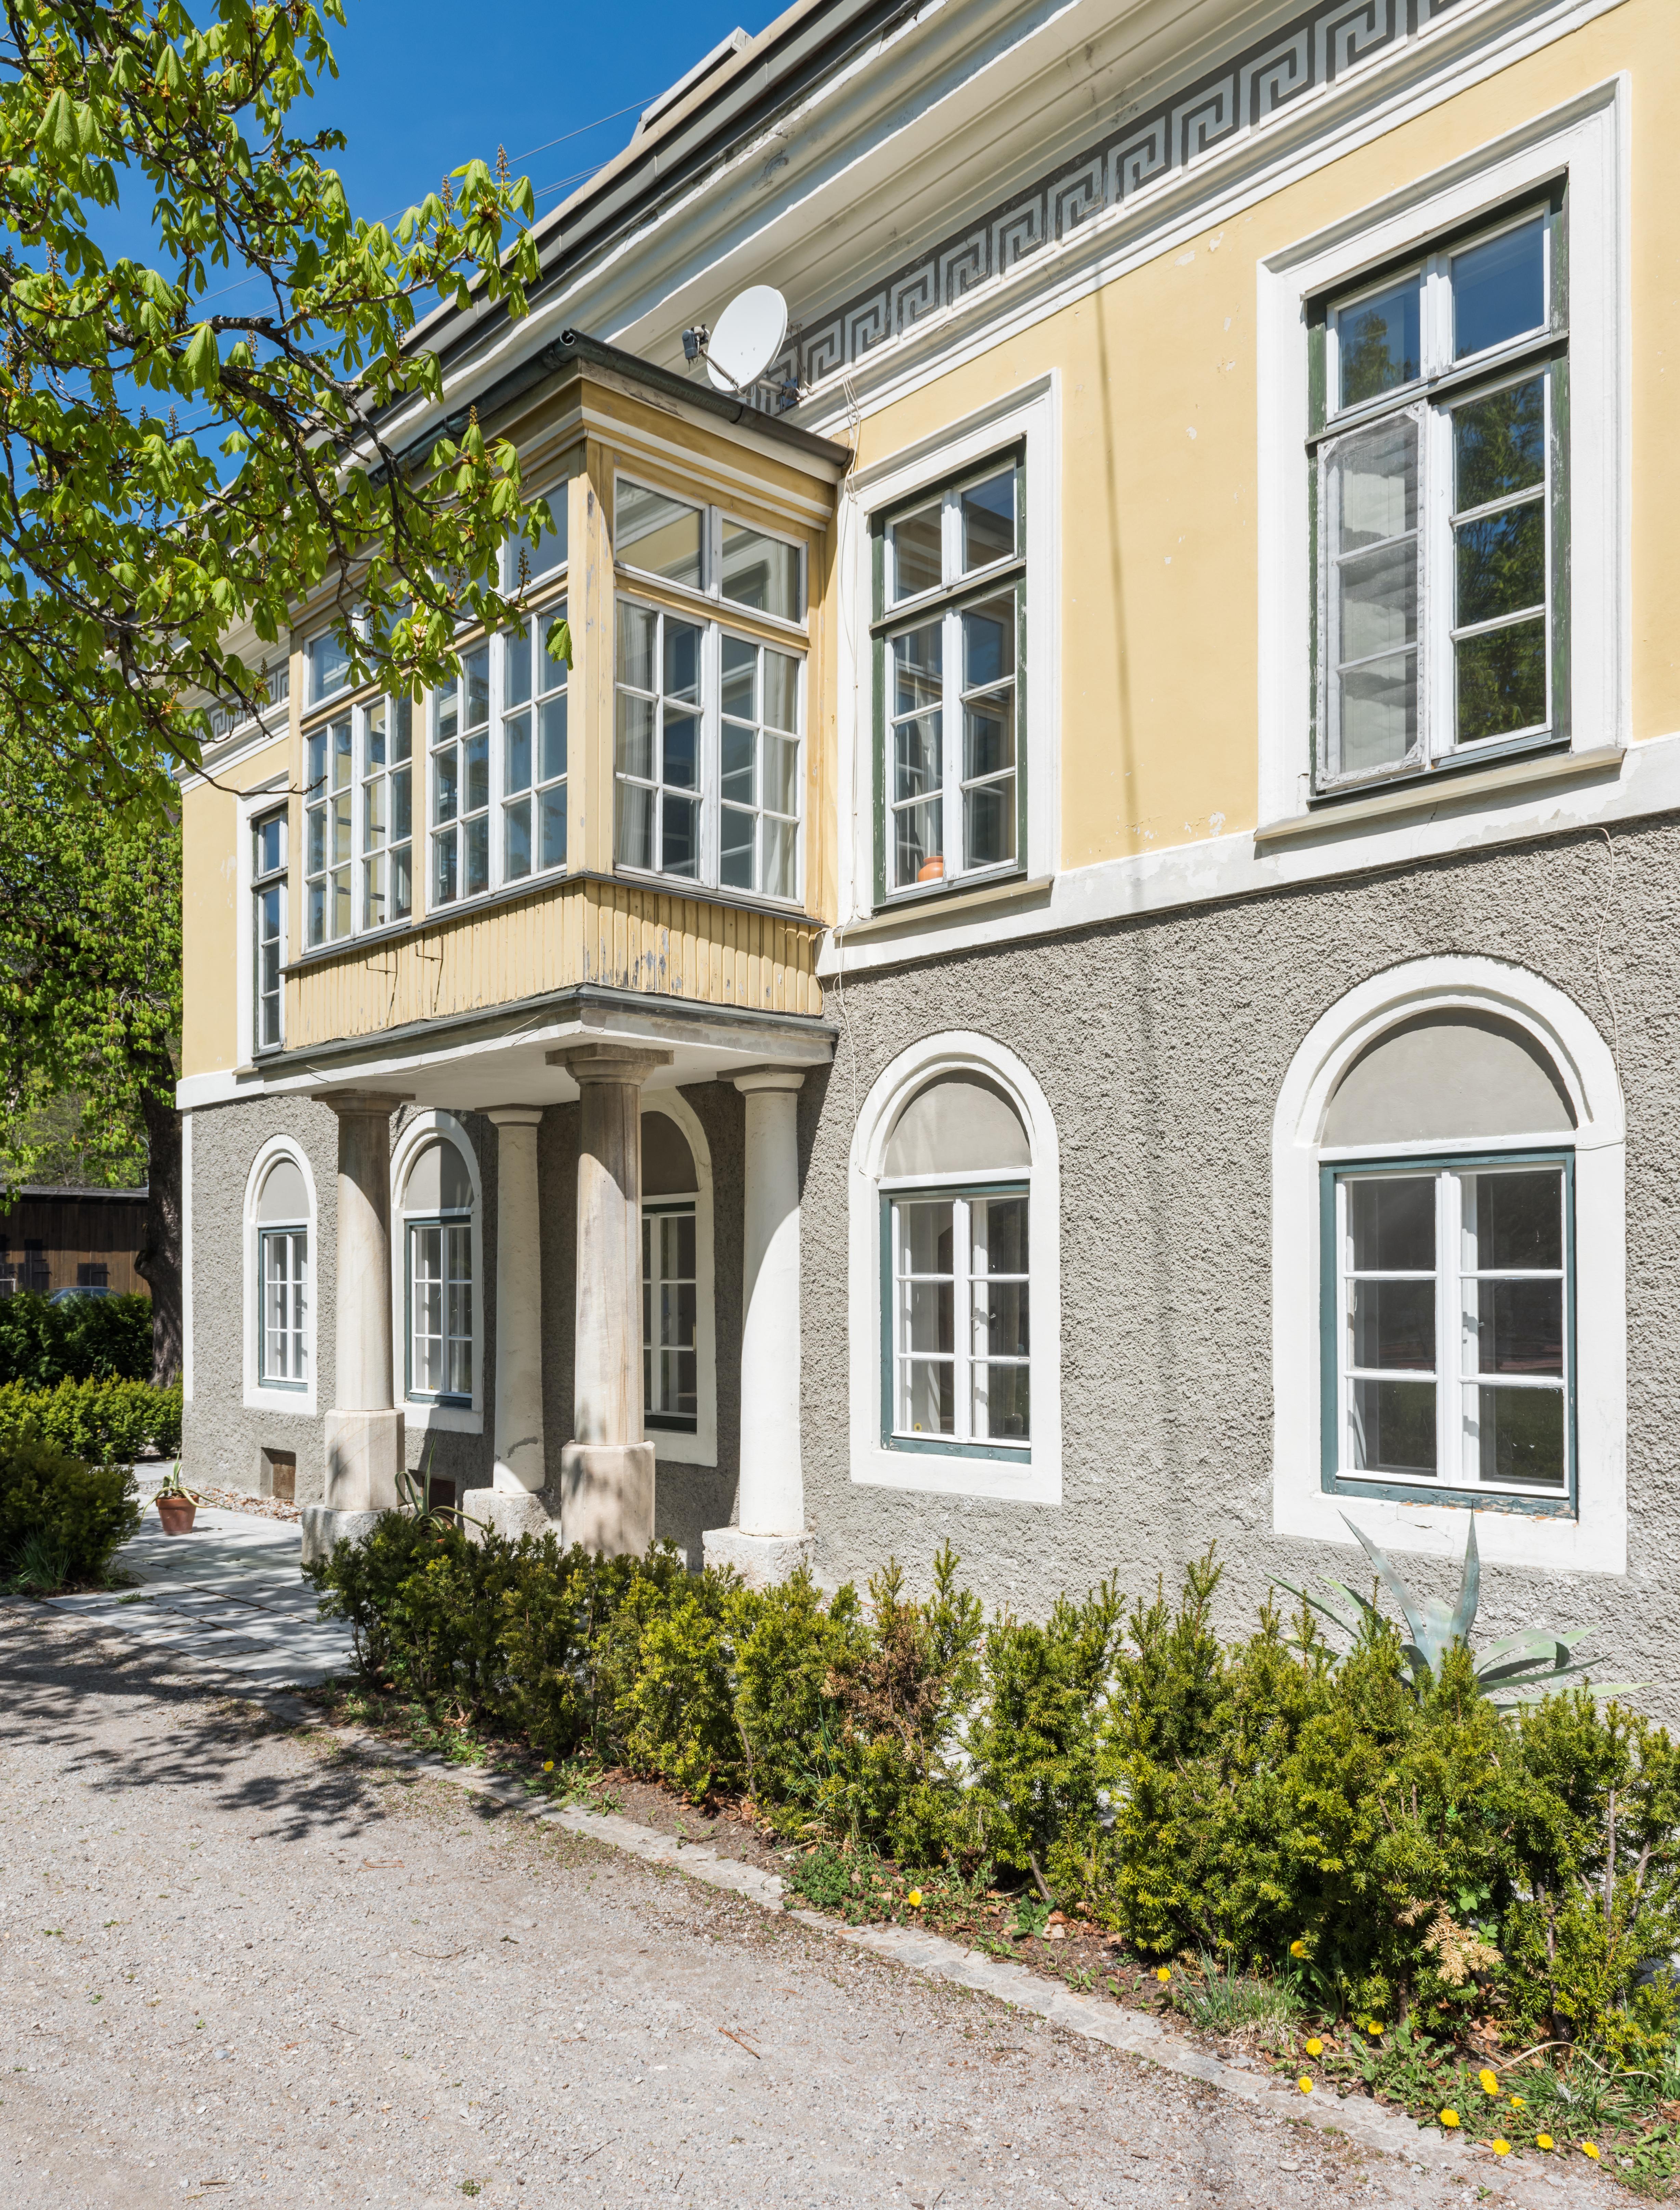 File:Bleiberg-Noetsch 2 ehem Gewerkenhaus Theresienhof S-Seite mit ...